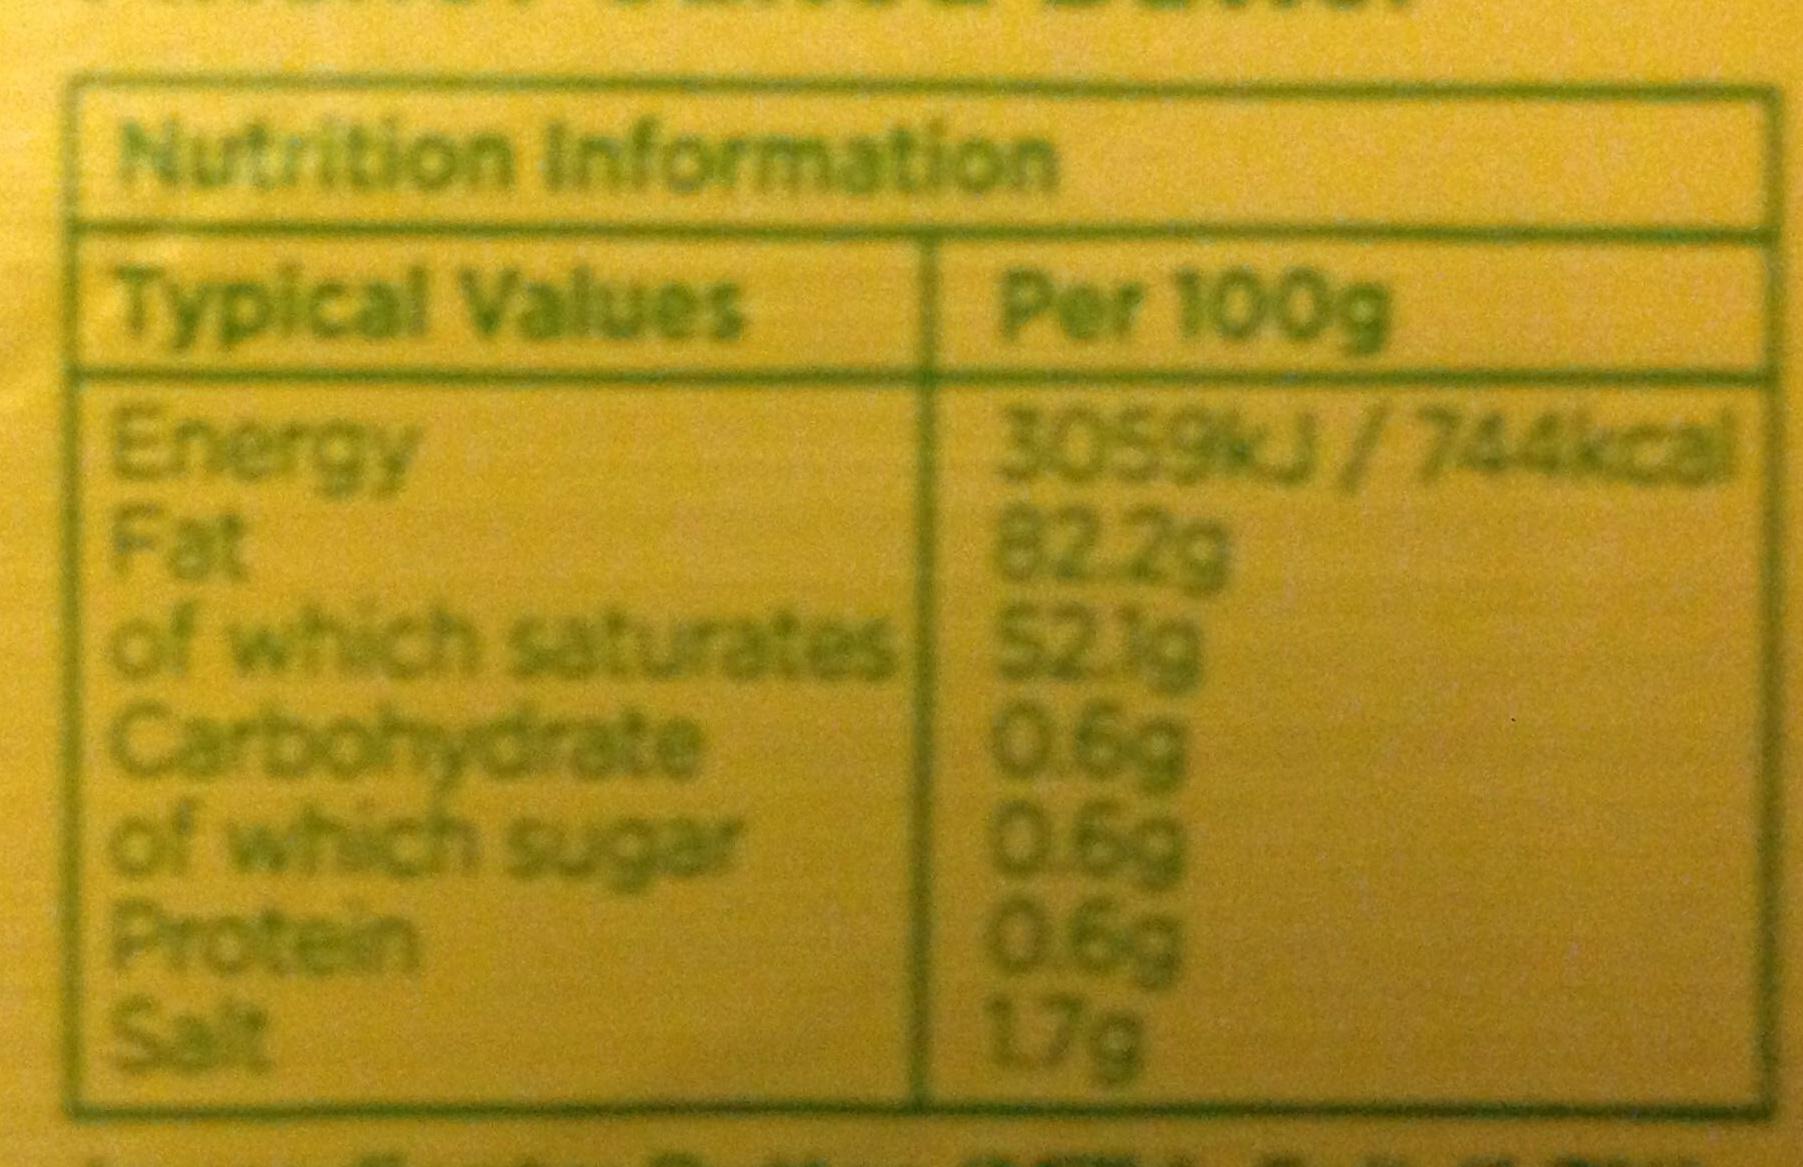 Anchor original butter - Nutrition facts - en